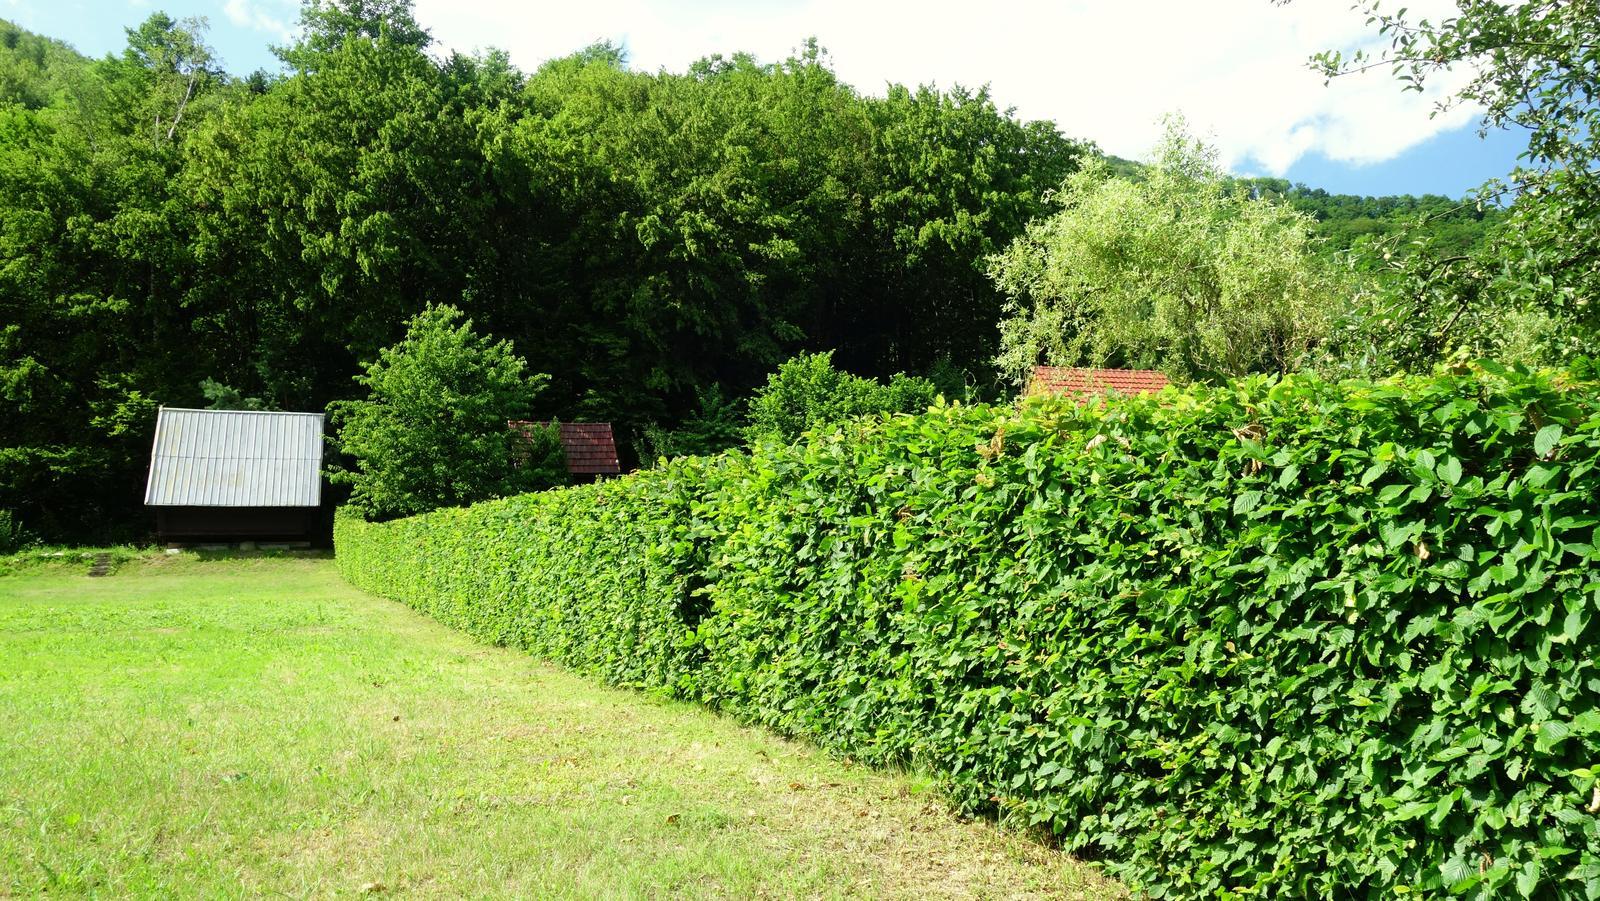 Ja mám živý plot... - Obrázok č. 1